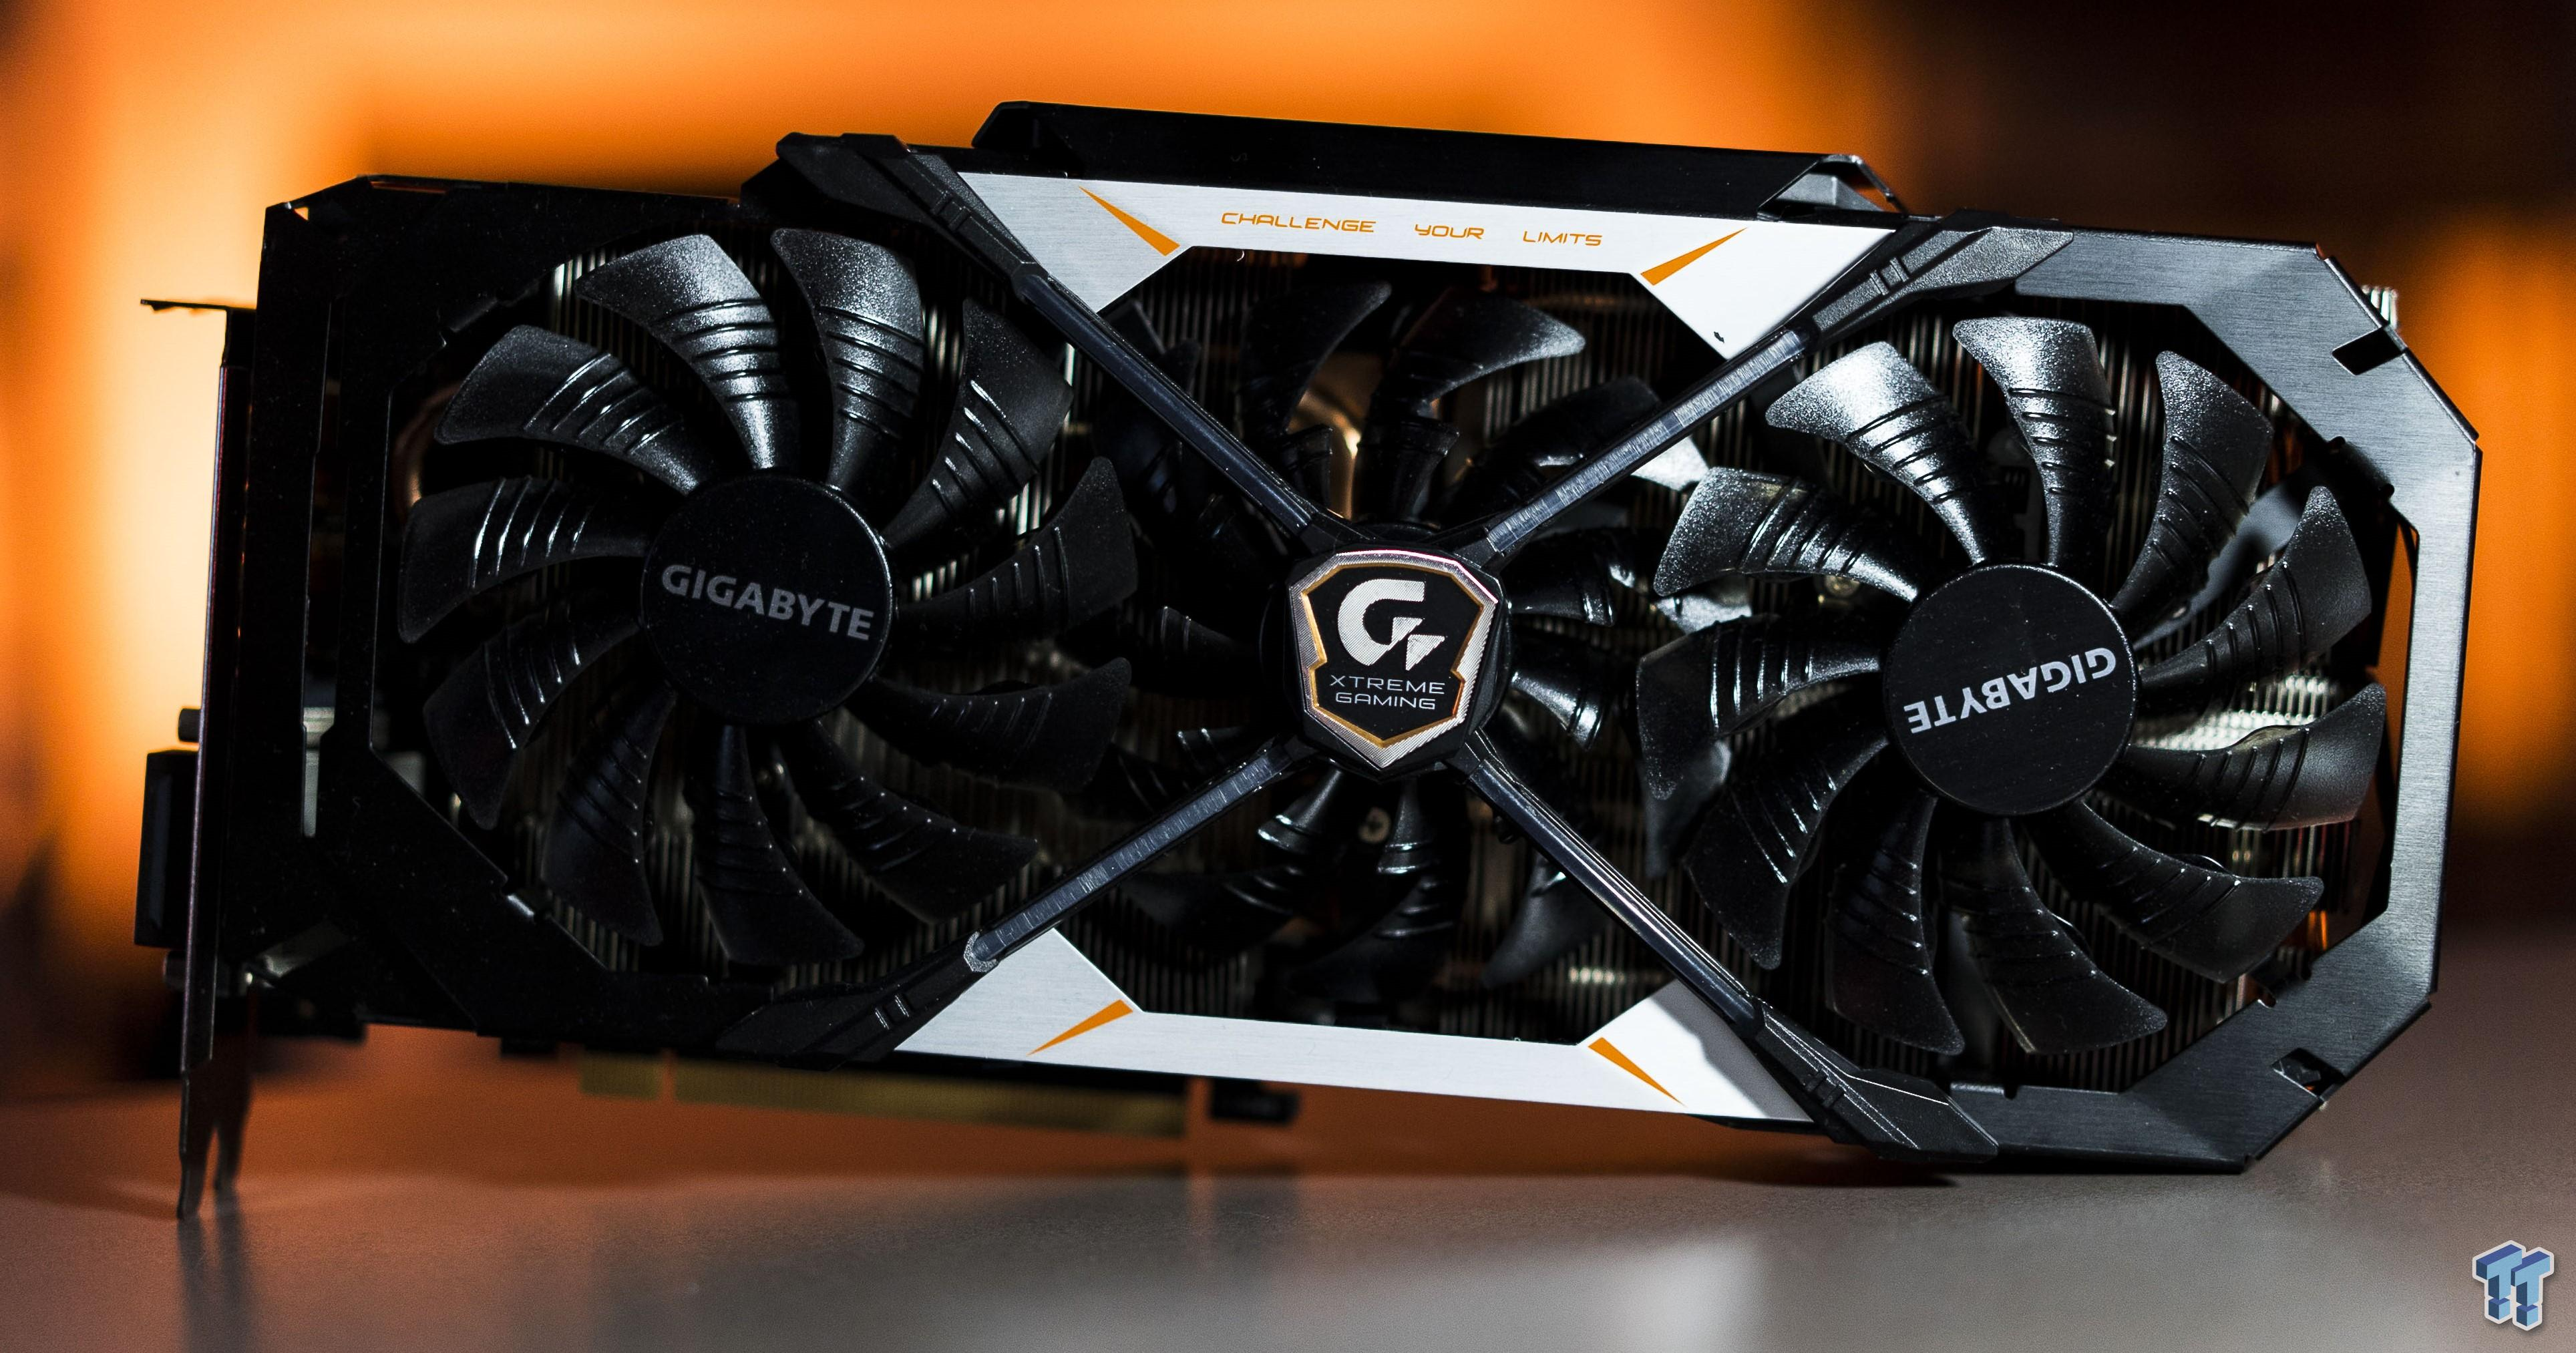 GIGABYTE GeForce GTX 1080 Xtreme Gaming - The Best VR